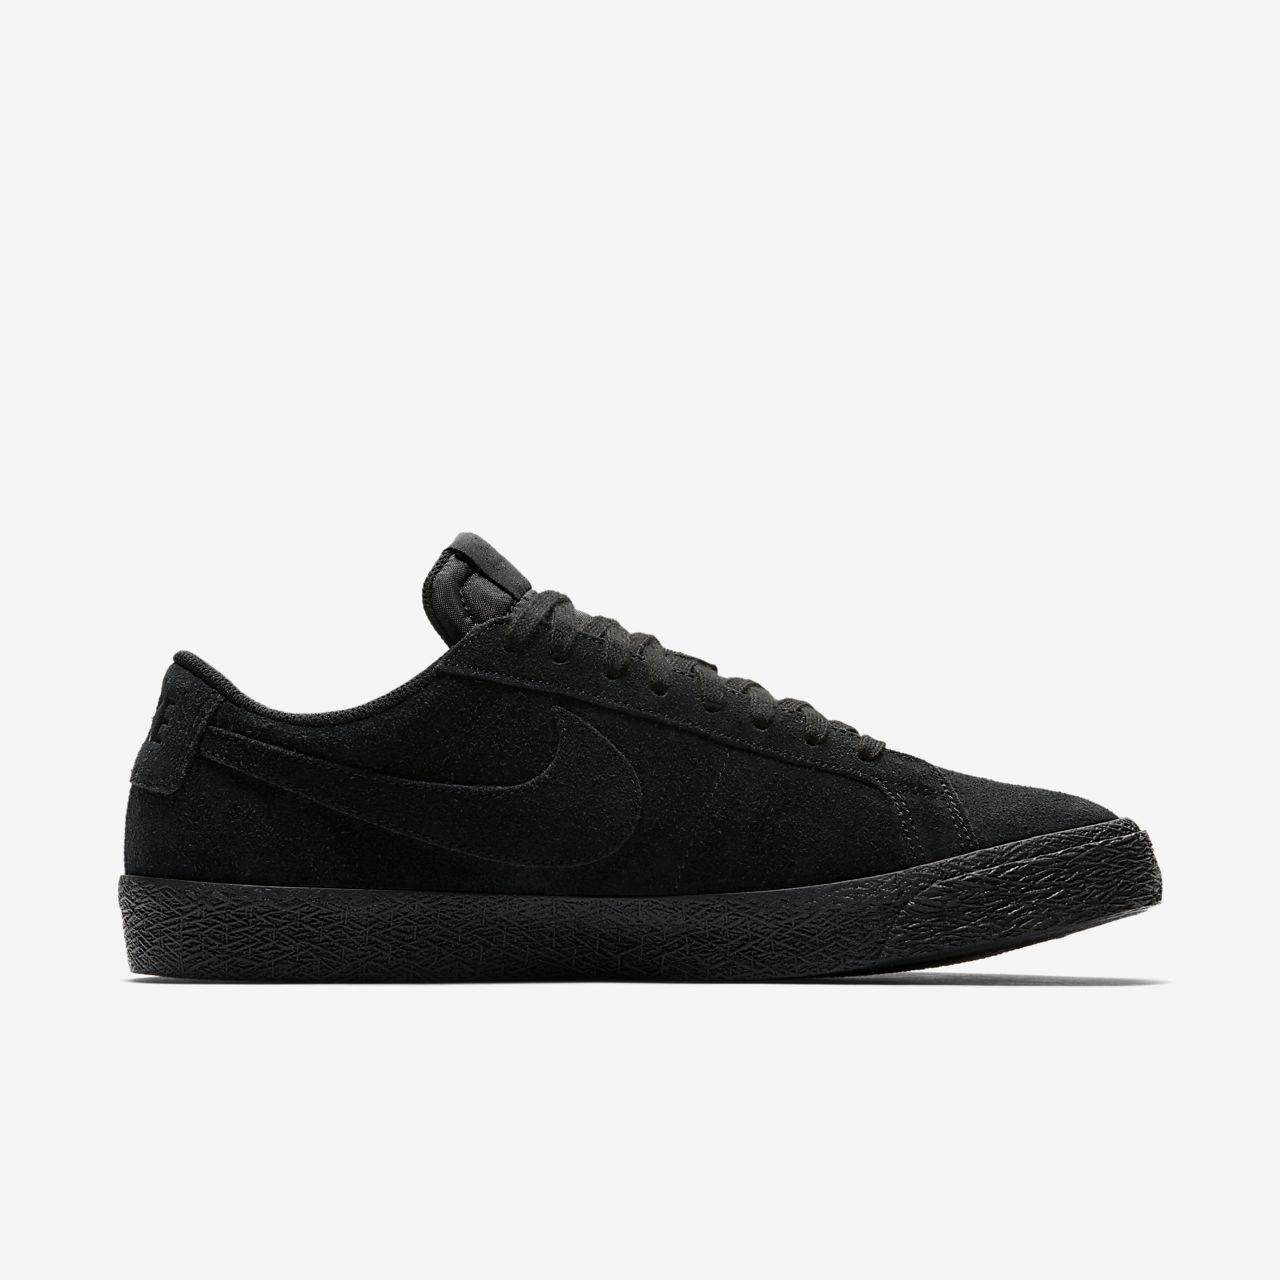 size 40 500b1 c6f71 ... Chaussure de skateboard Nike SB Blazer Zoom Low pour Homme